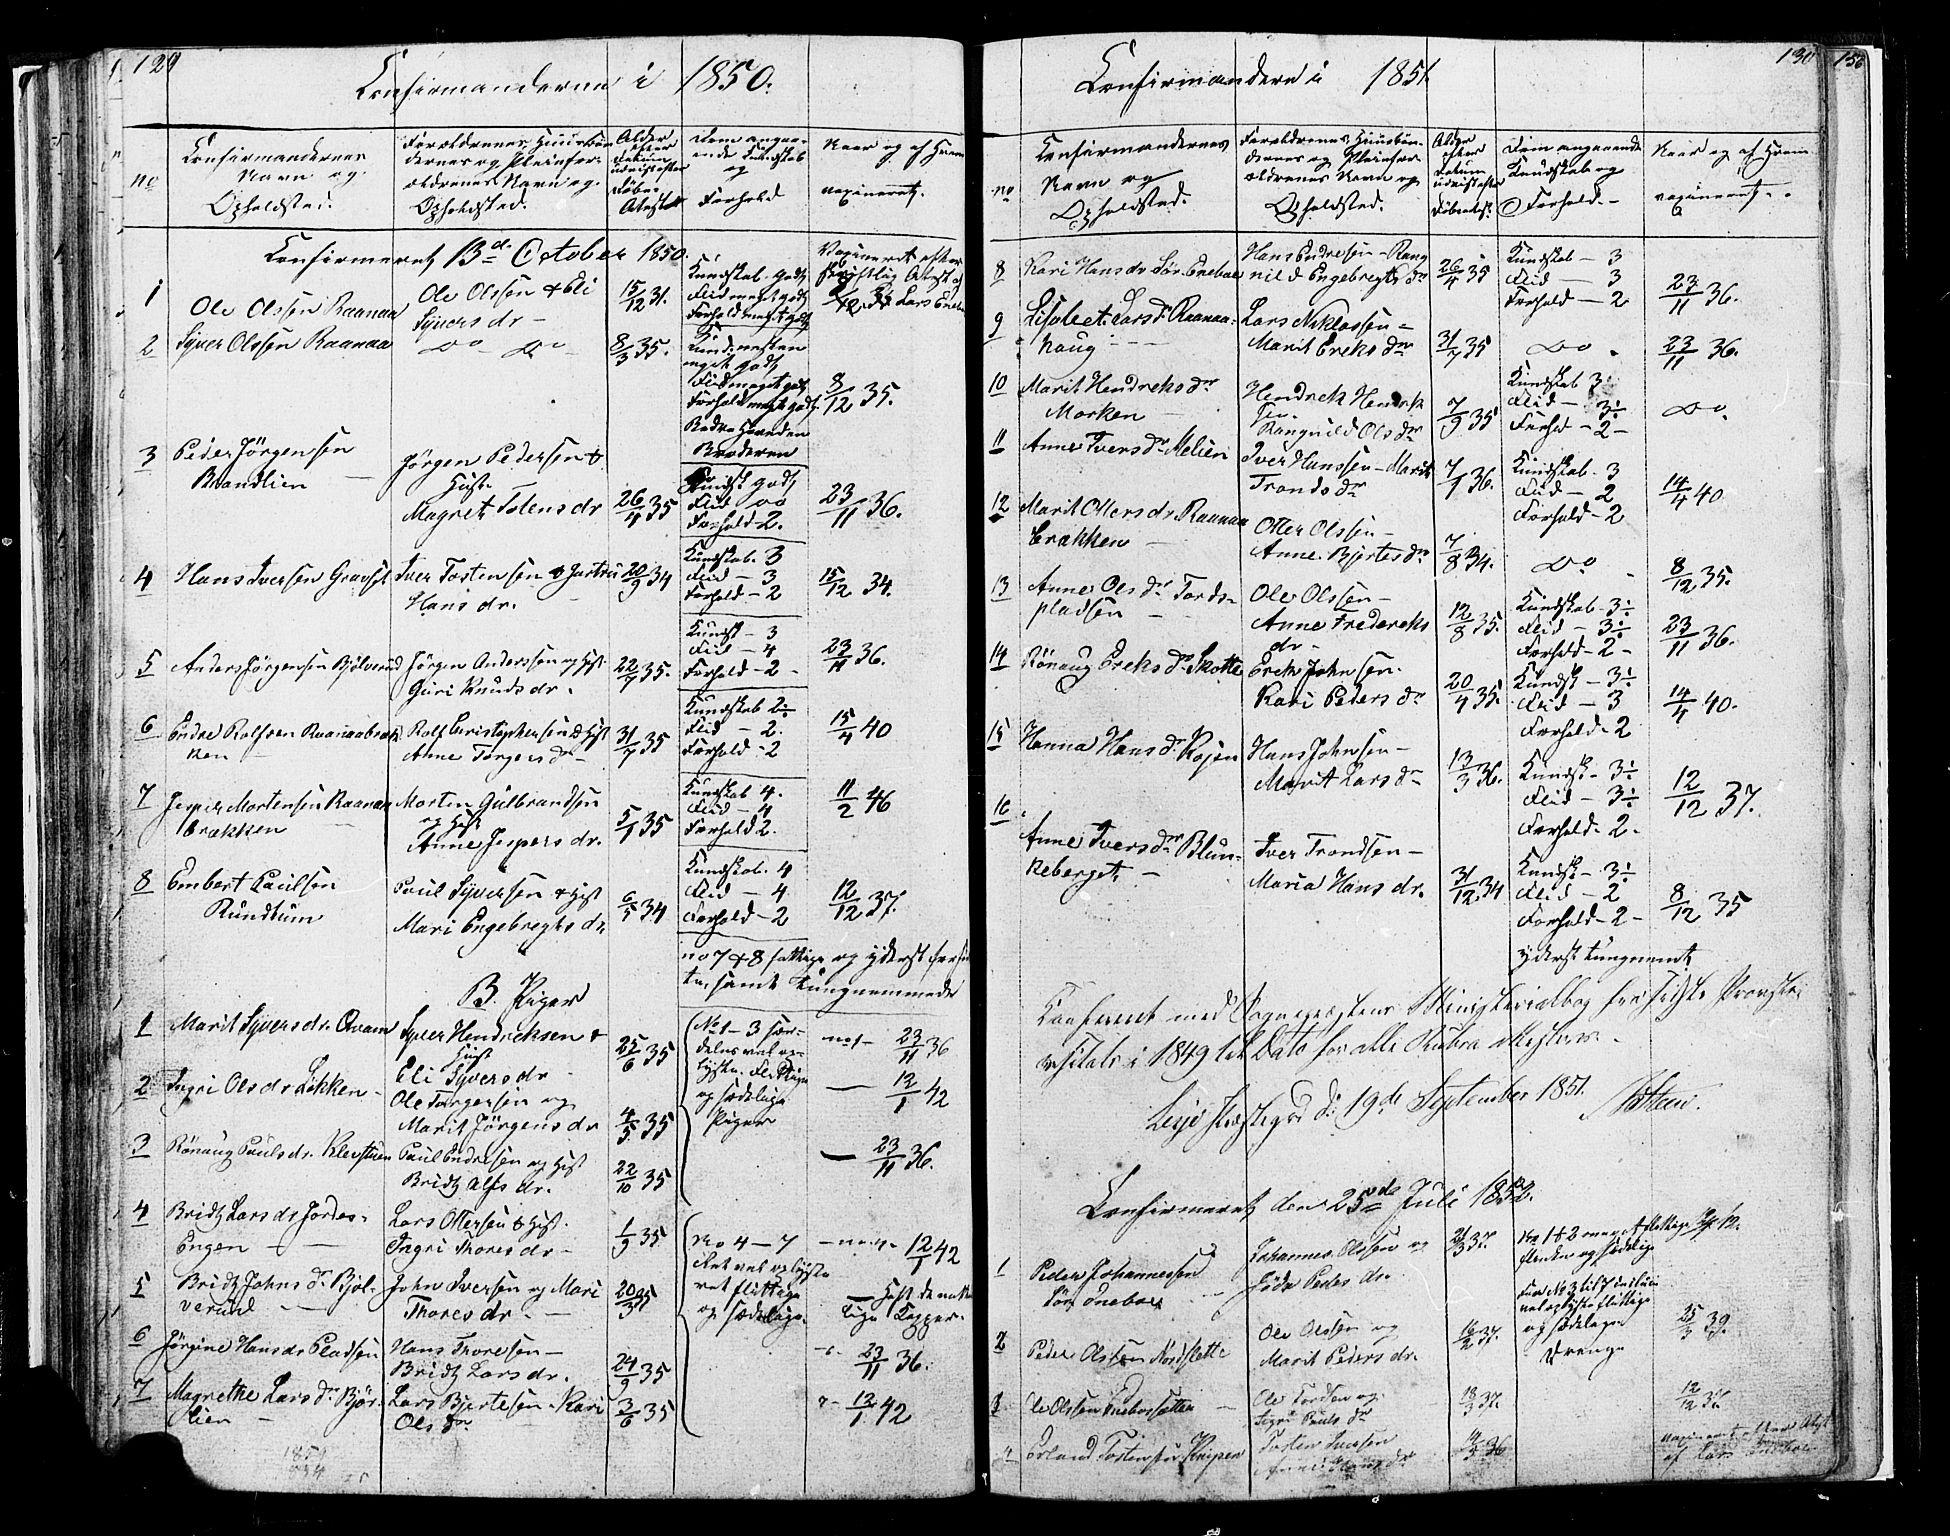 SAH, Lesja prestekontor, Klokkerbok nr. 4, 1842-1871, s. 129-130